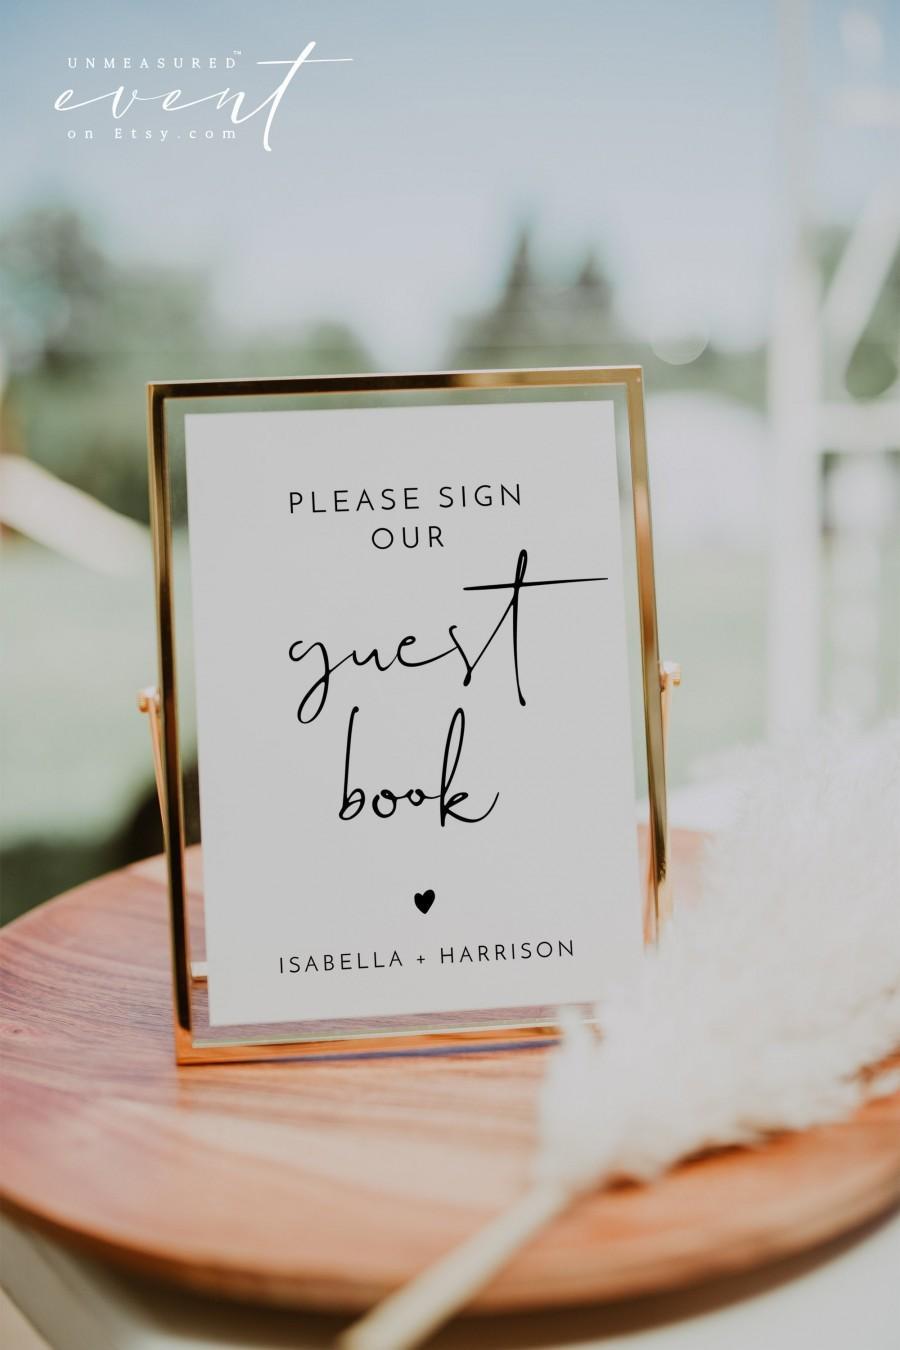 Wedding - ADELLA  Please Sign Our Guestbook Sign Printable, Sign Our Guestbook, Wedding Guestbook Sign Instant, Modern Minimalist Wedding Signage DIY